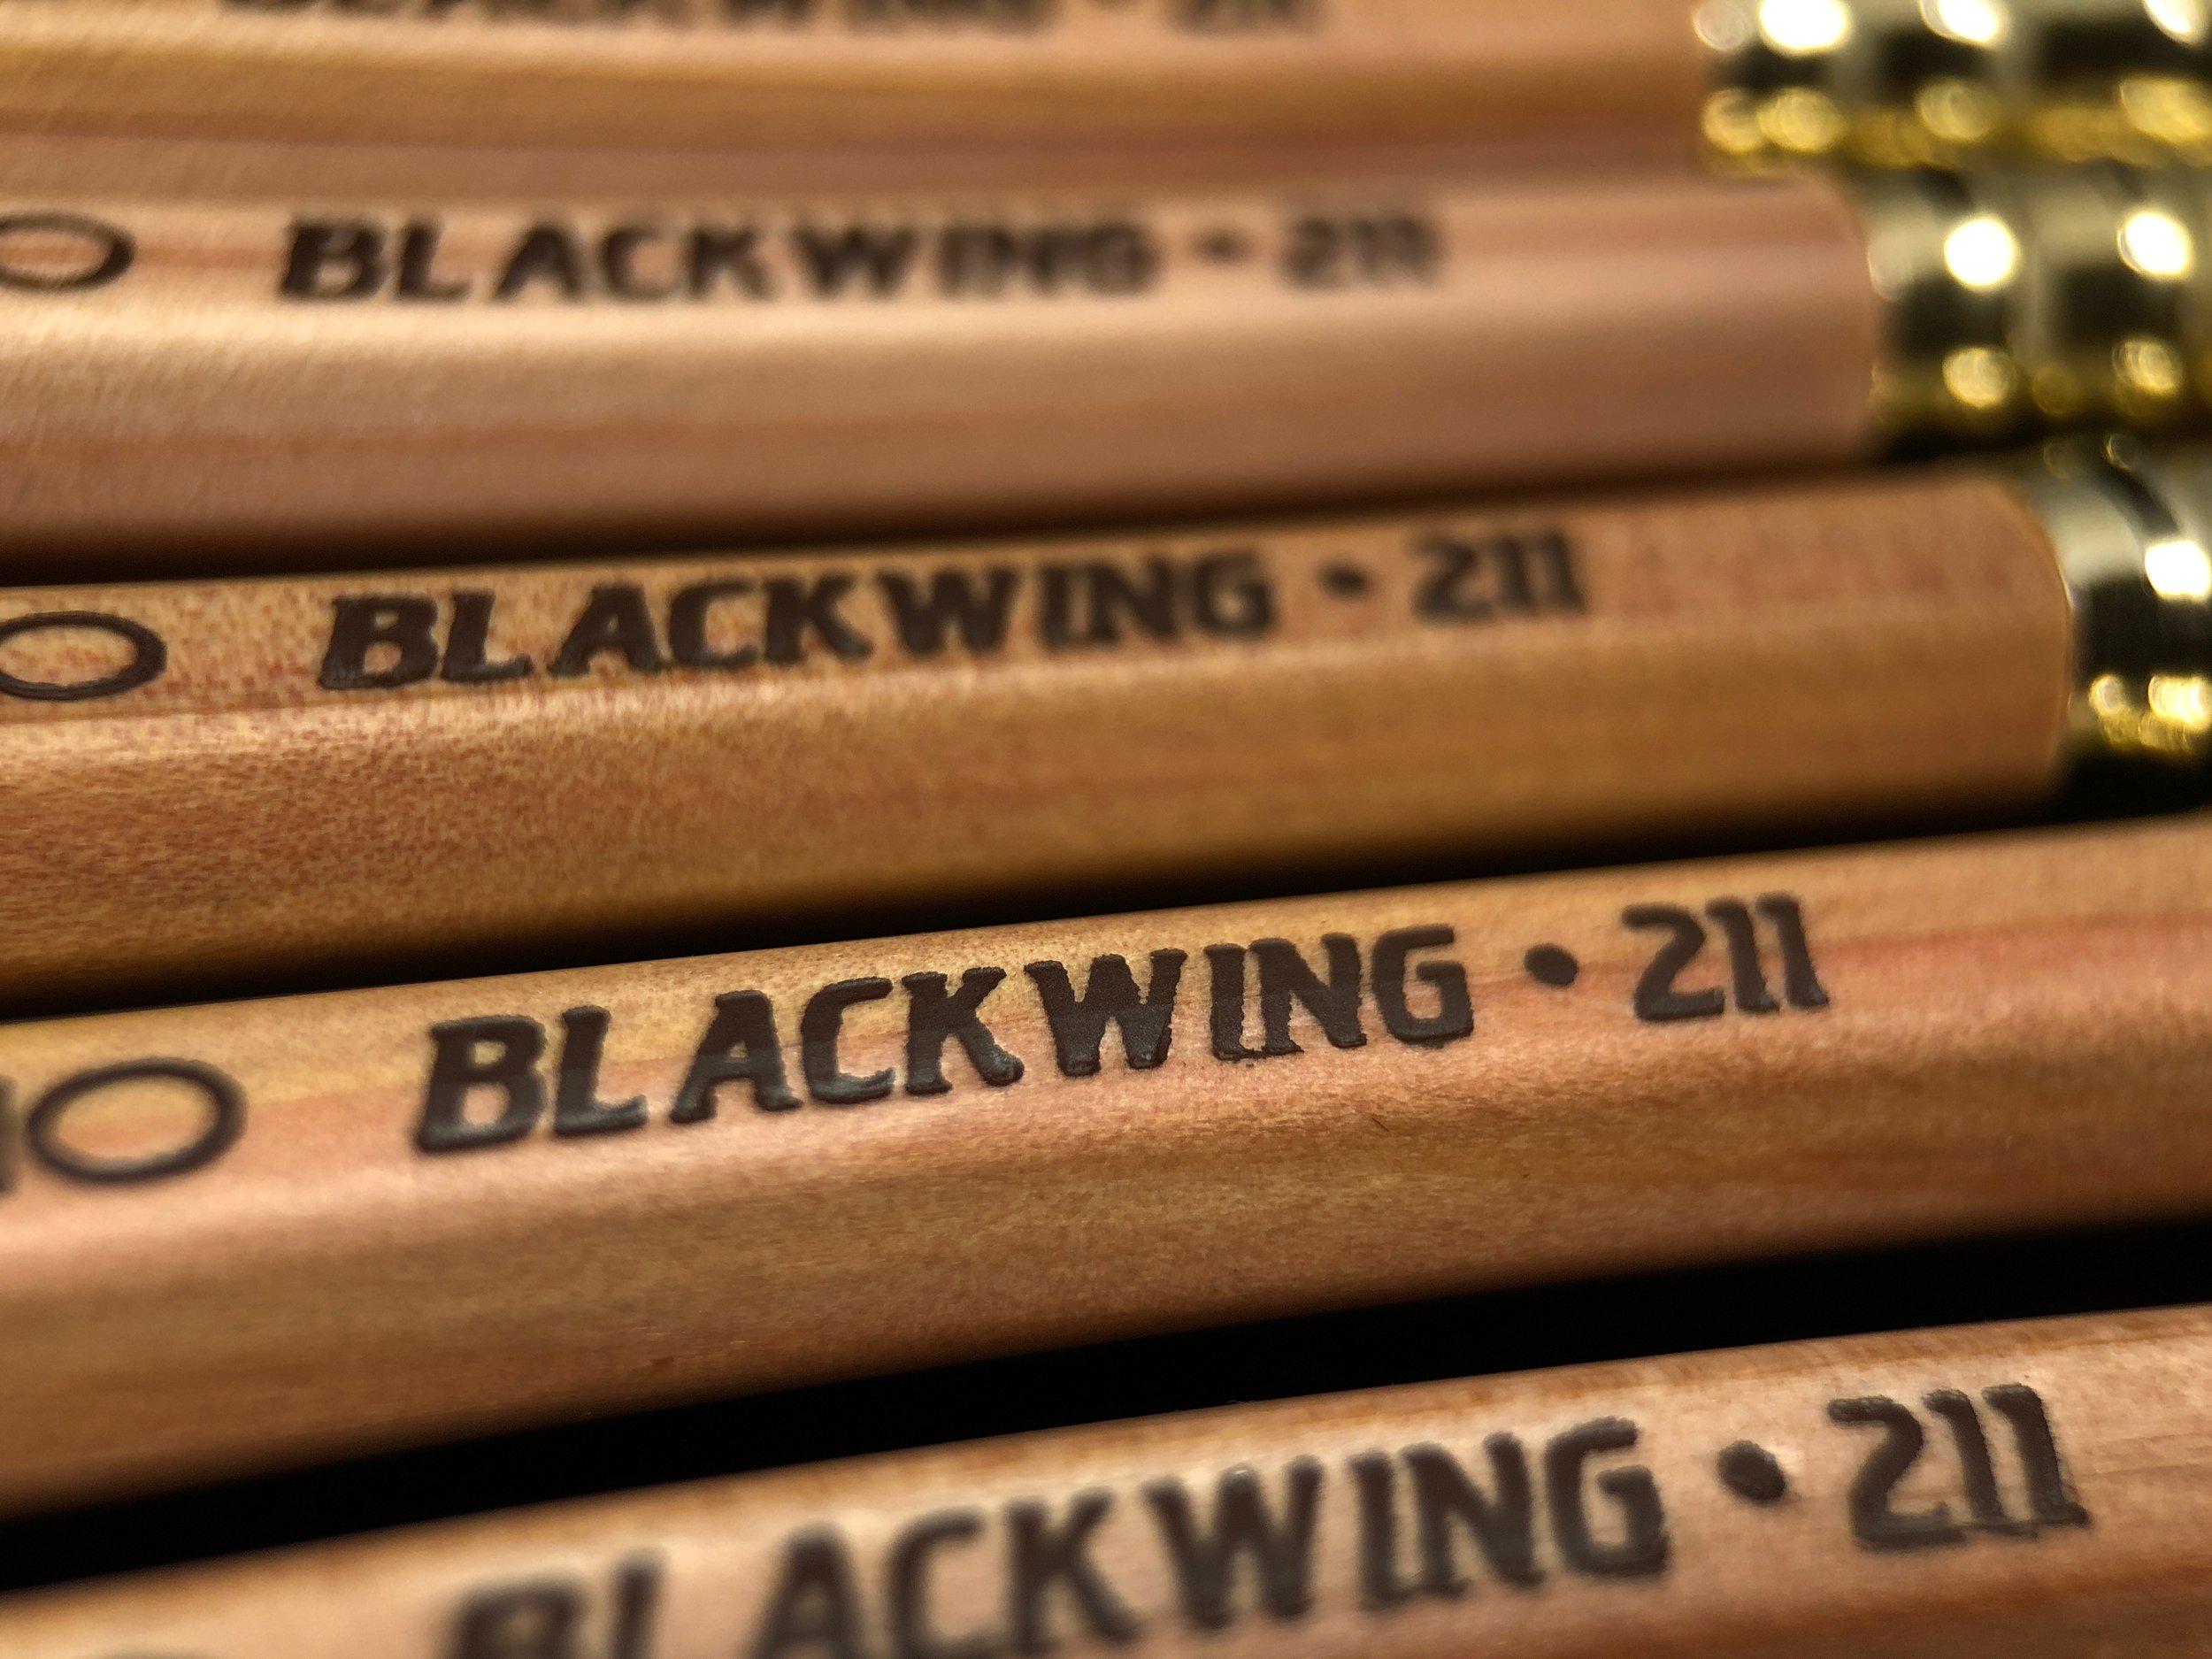 palomino-blackwing-211-pencil-9.jpg